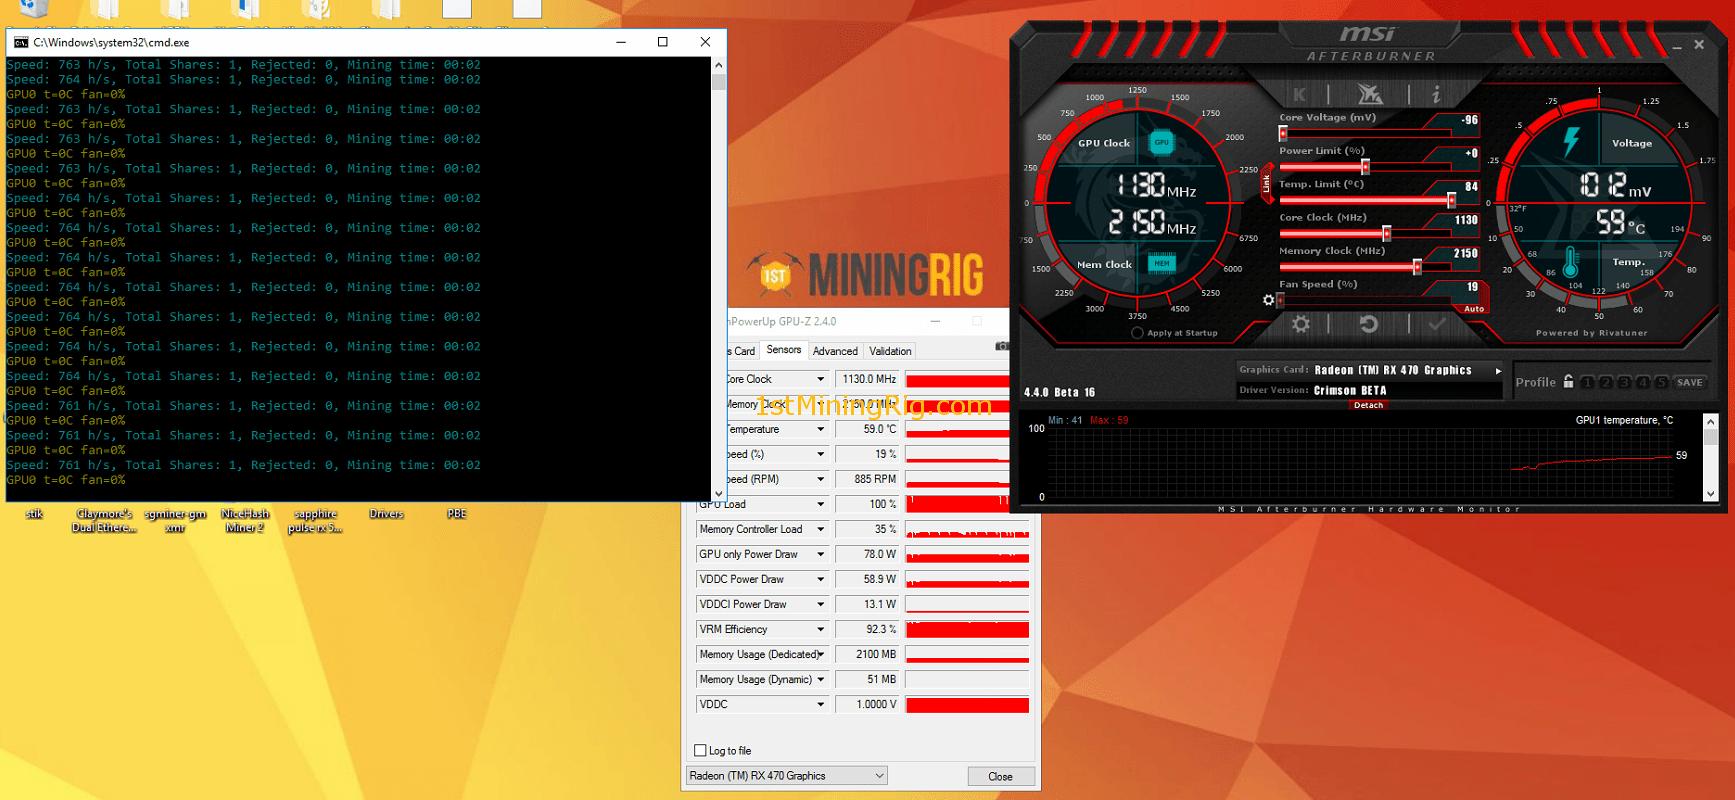 Лучший BIOS ROM для Sapphire RX 470 8GB Mining Edition с